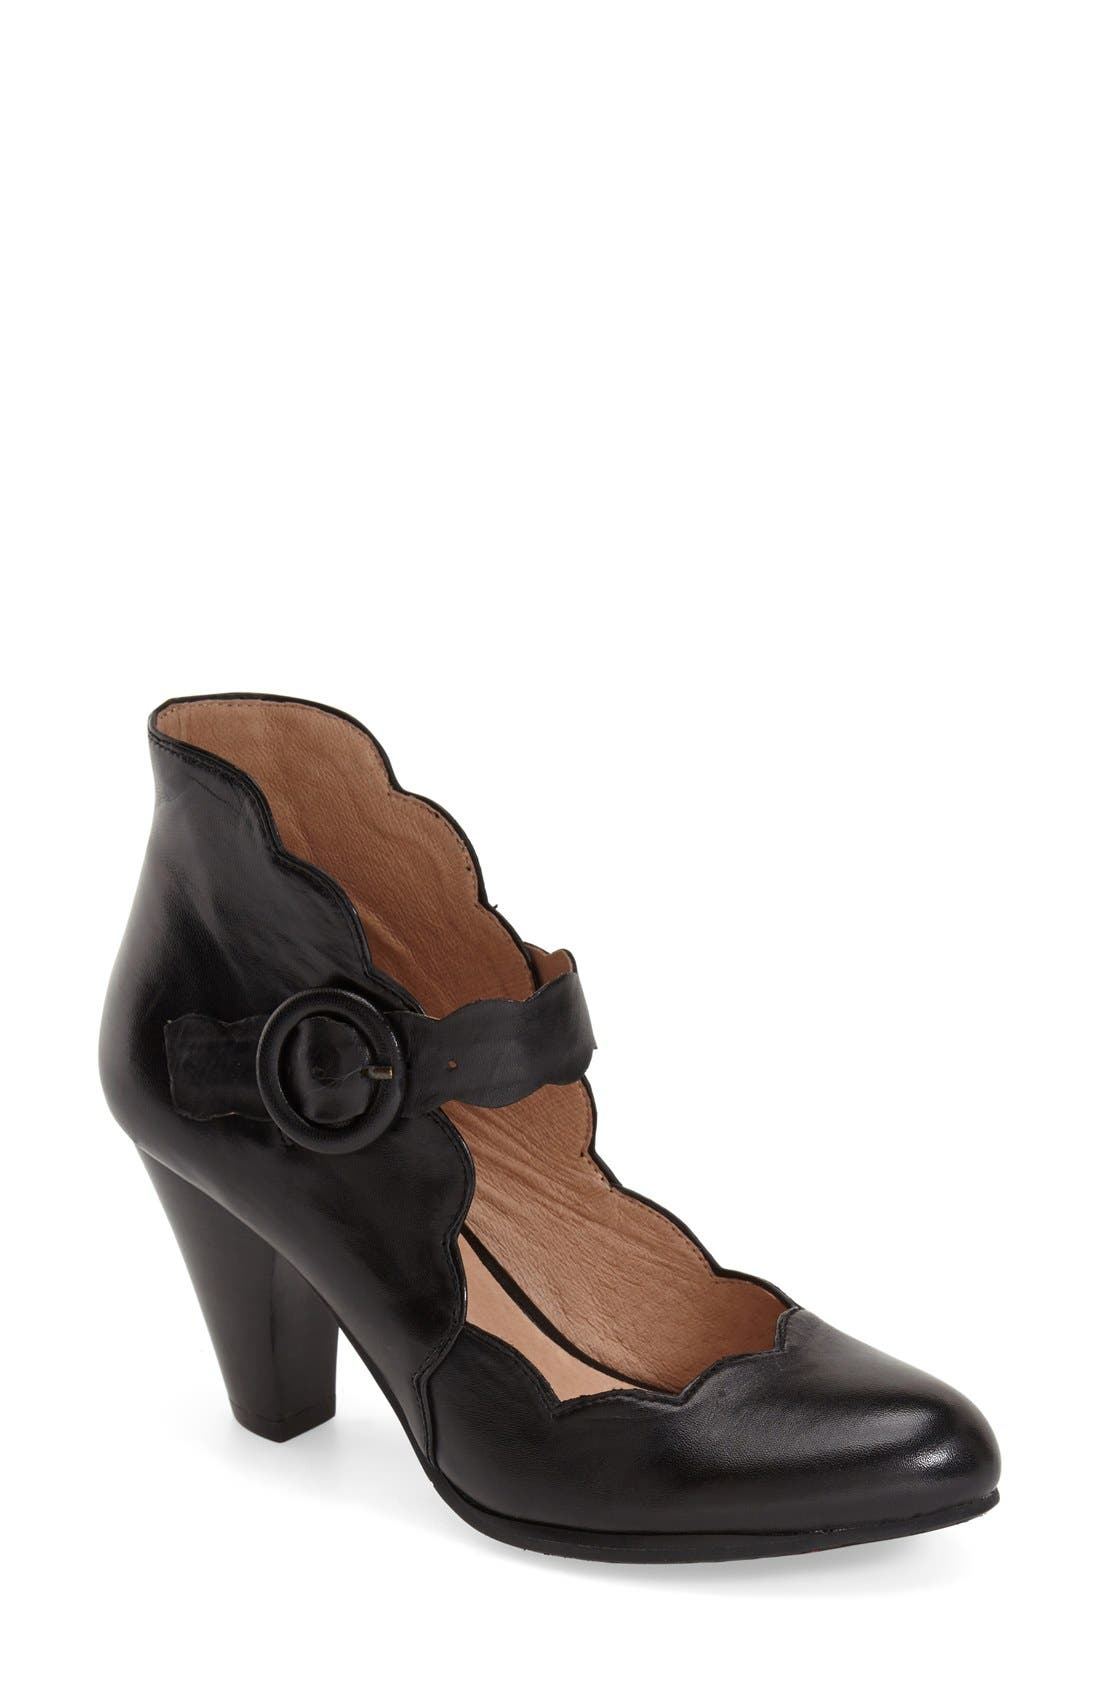 Footwear 'Carissa' Mary Jane Pump,                         Main,                         color, 001